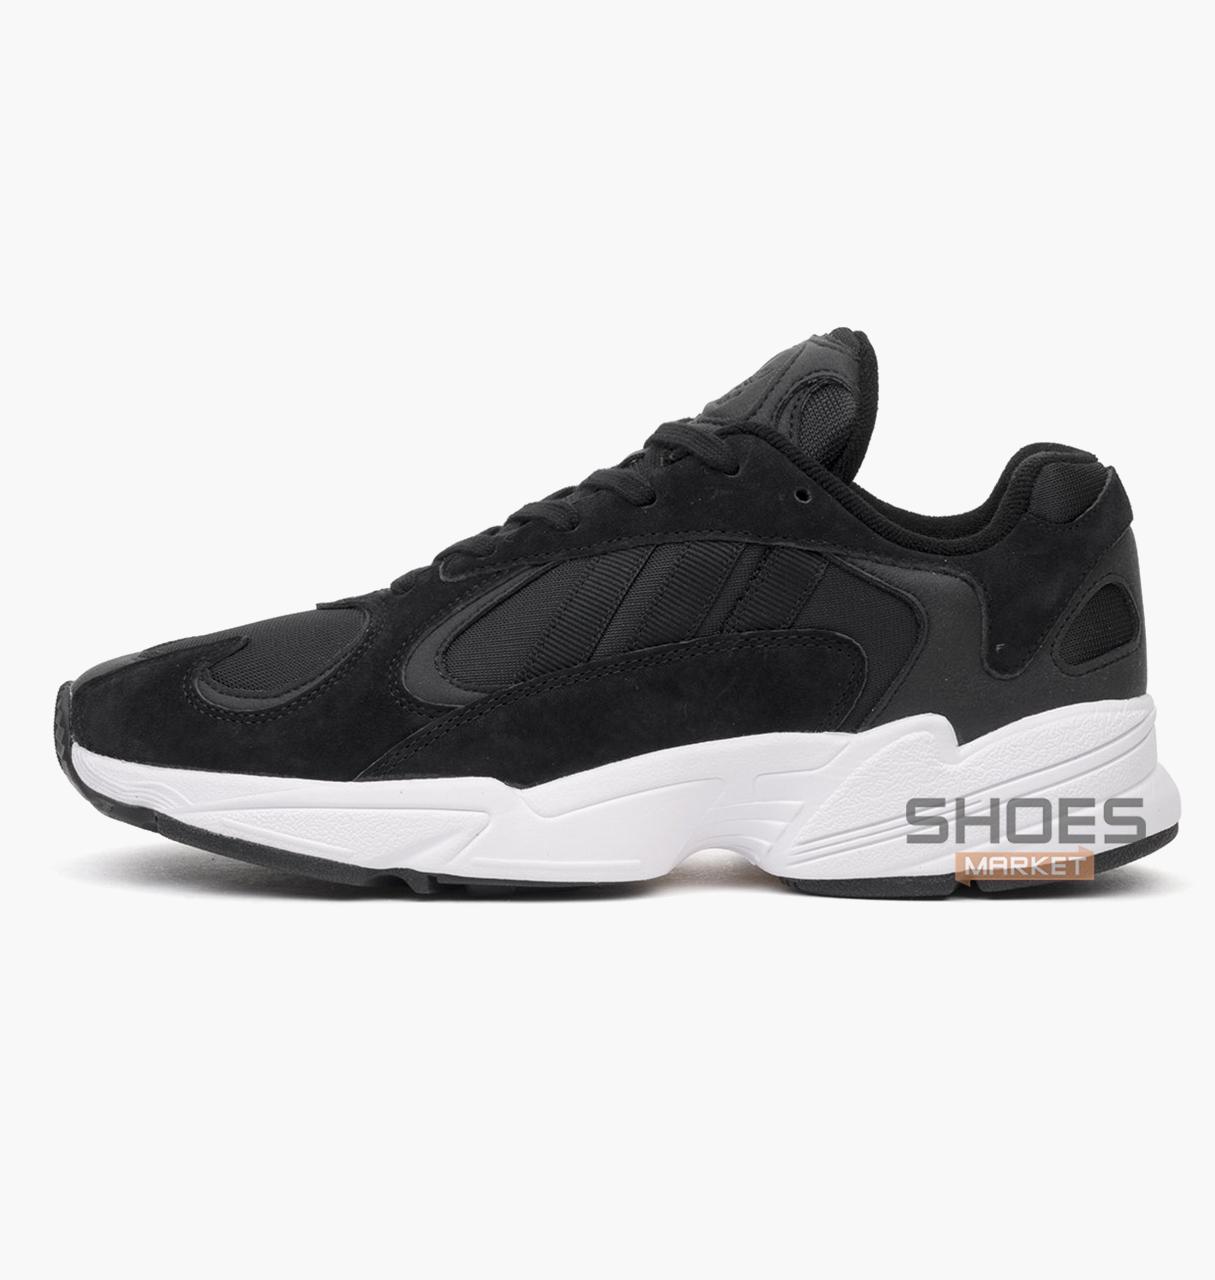 "Мужские кроссовки Adidas Yung-1 ""Core Black"" Black CG7121, оригинал"